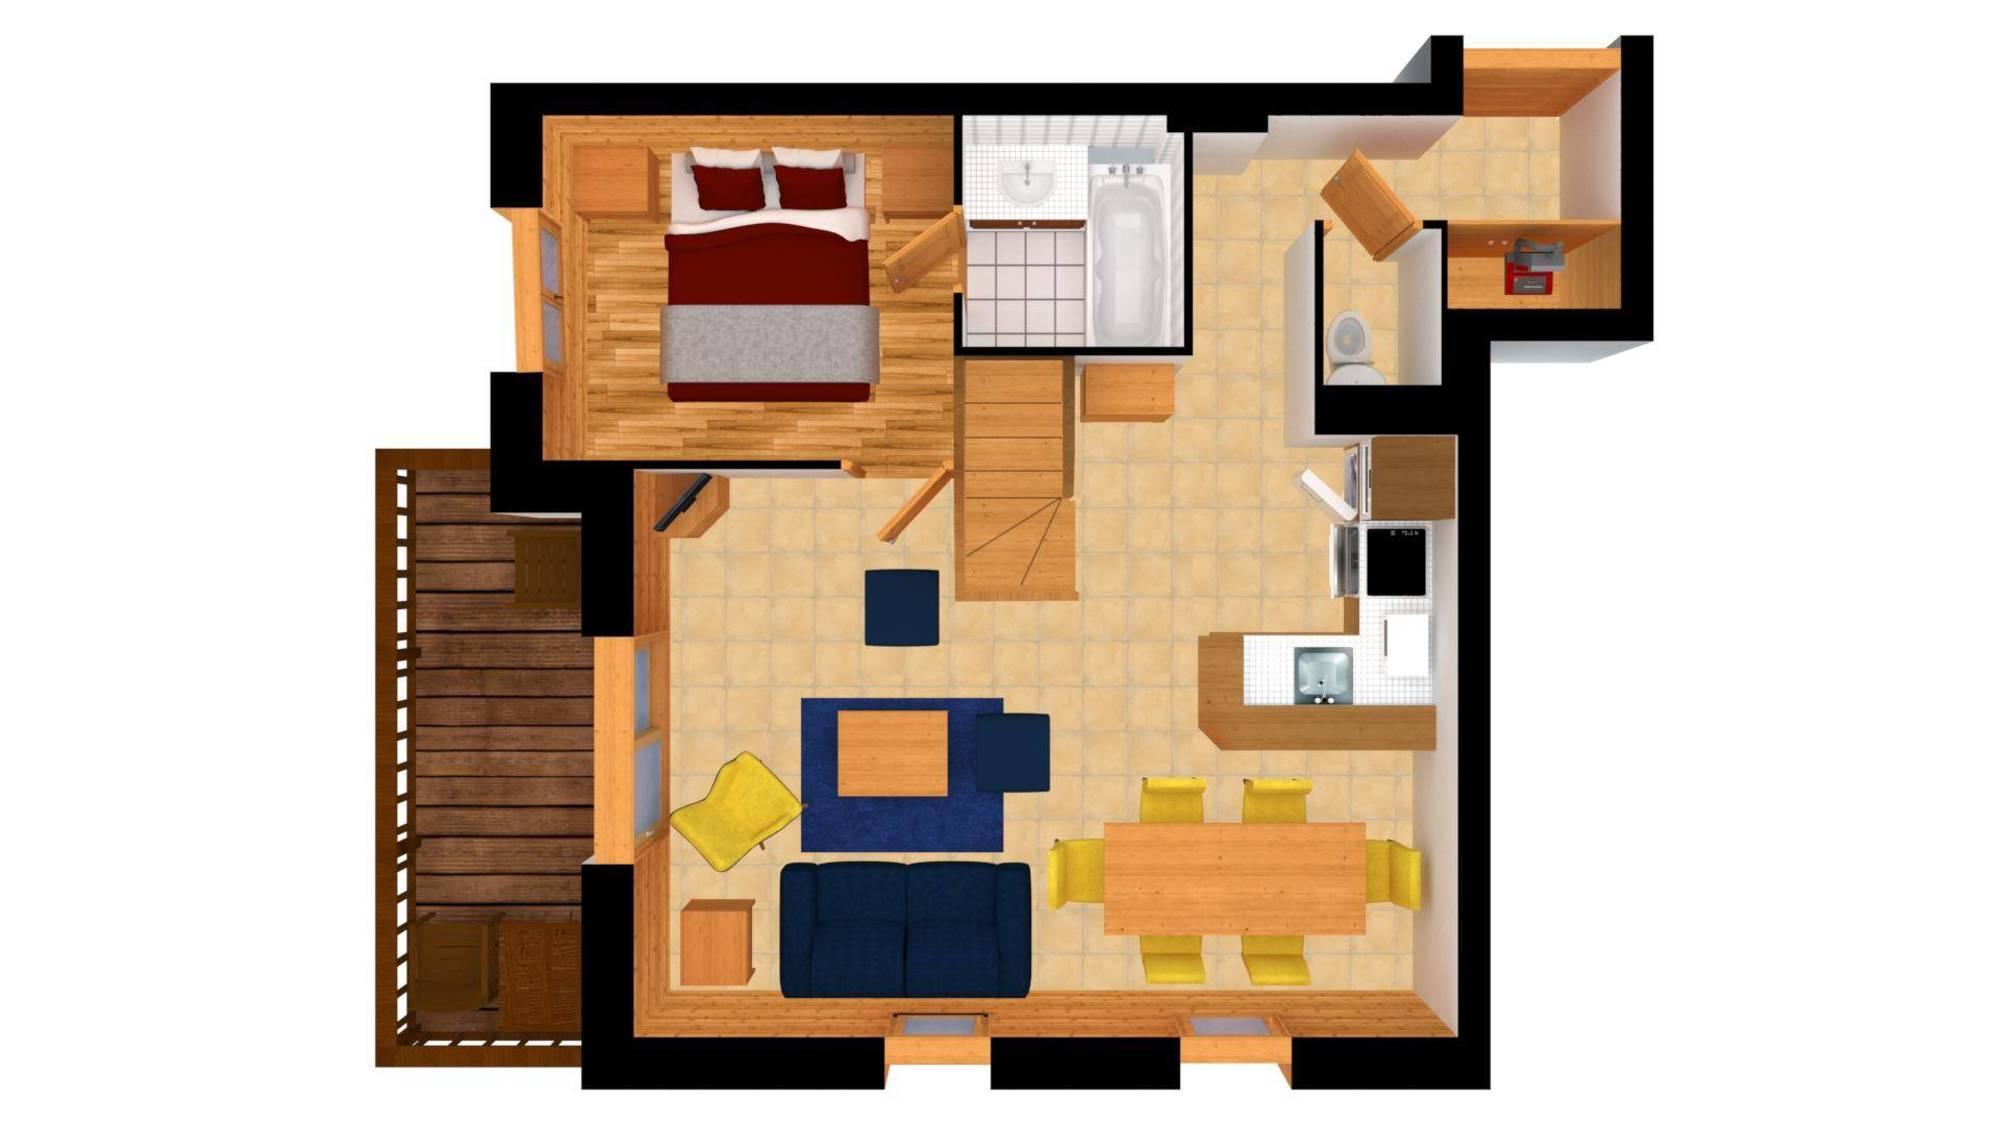 Apartment FERM ESKIMO12 Meribel Floor Plan 1